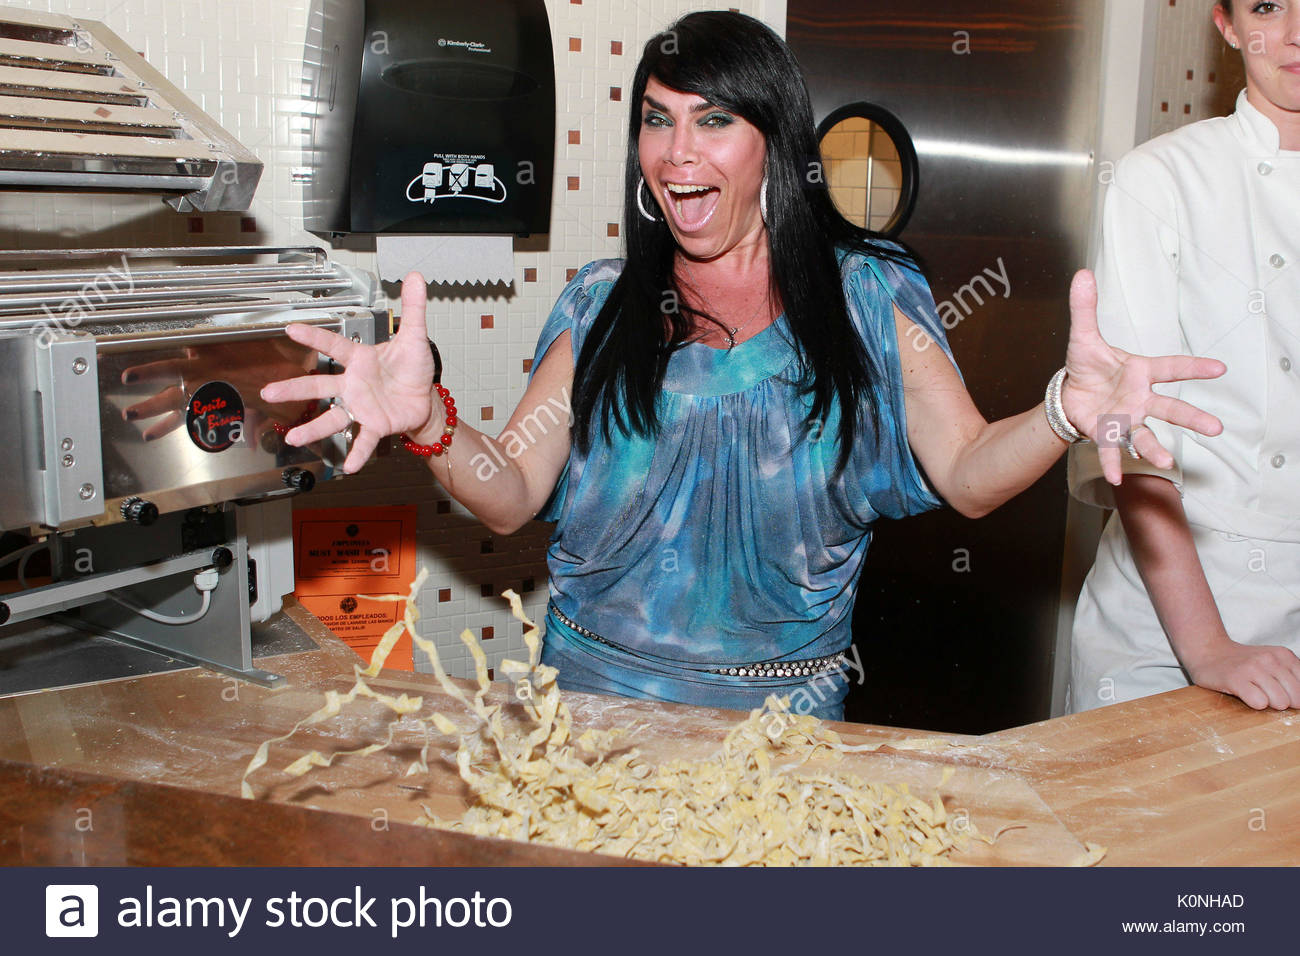 Renee graziano renee graziano star of mob wives meet and greet renee graziano star of mob wives meet and greet at sorrisi italian restaurant at seminole coconut creek casino on saturday evening m4hsunfo